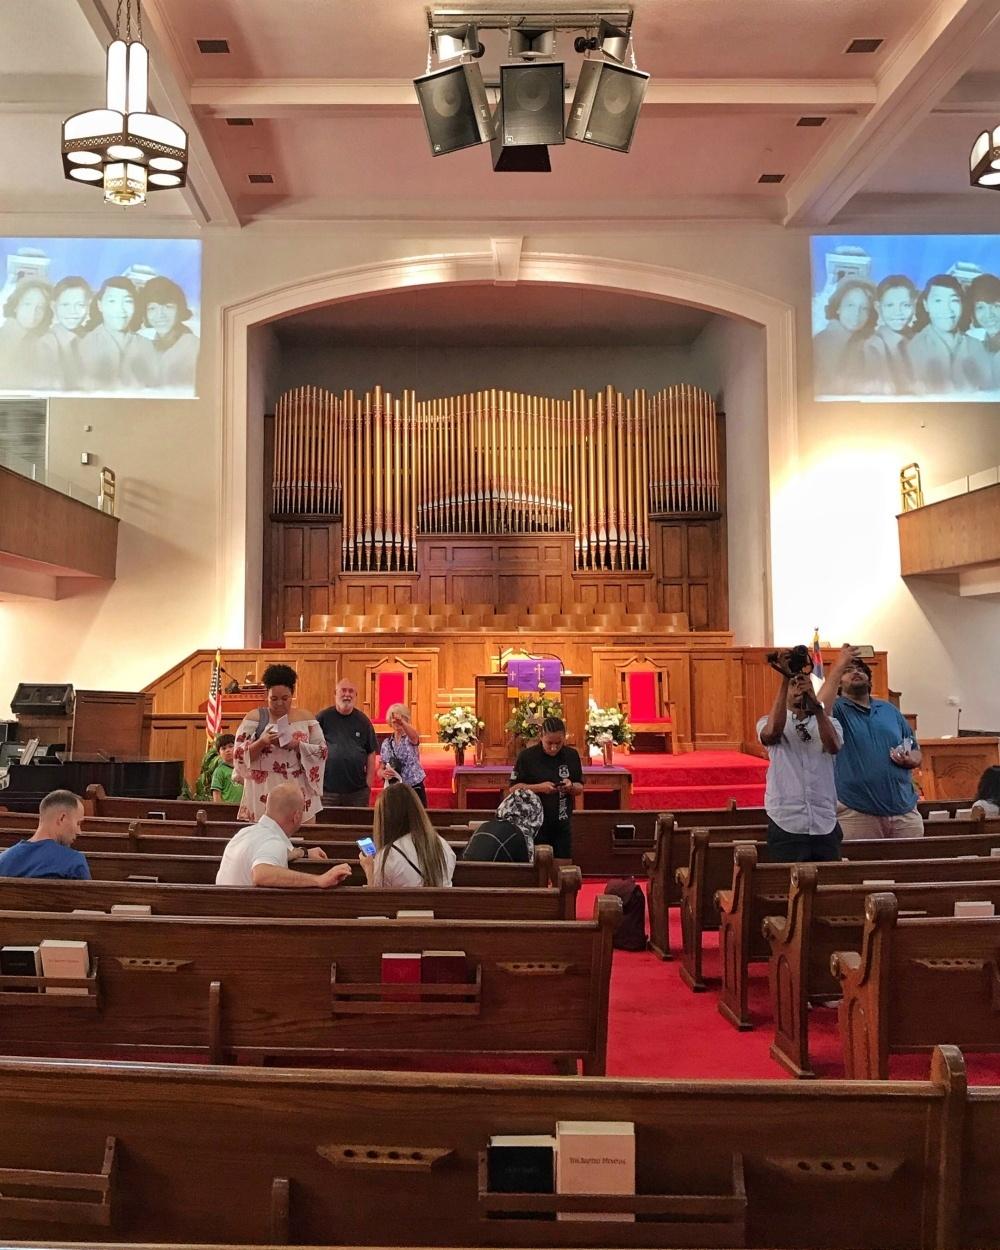 Interior of 16th St Baptist Church, Birmingham, Alabama Photo Heatheronhertravels.com